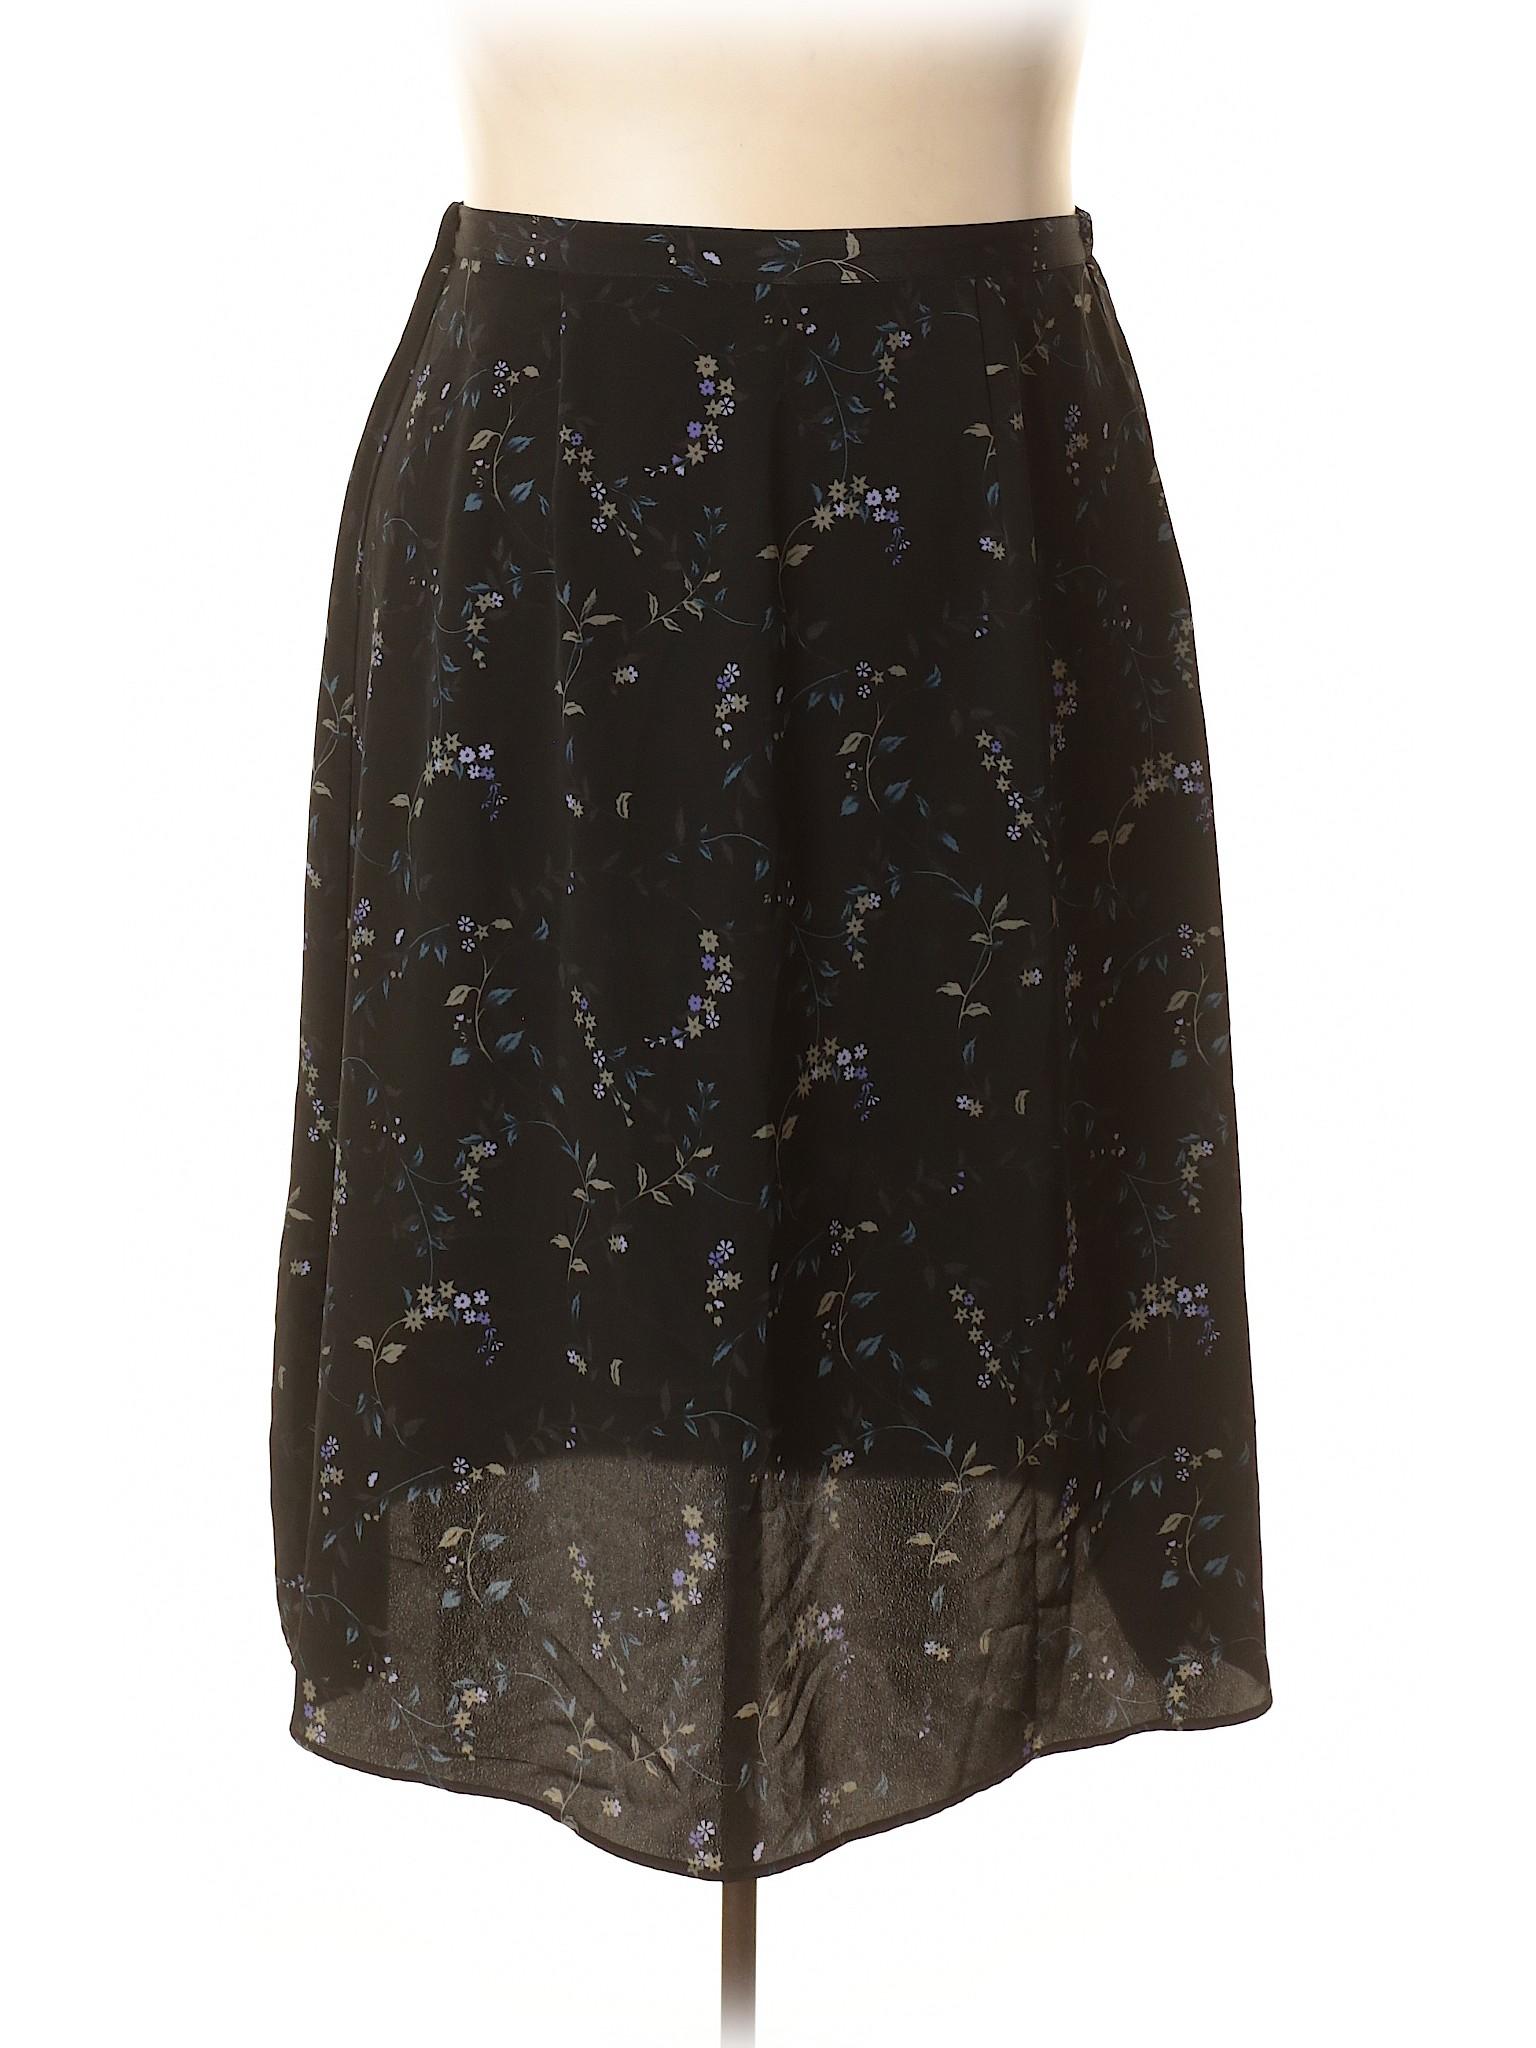 Boutique Skirt Casual Boutique Boutique Skirt Casual Skirt Boutique Skirt Casual Casual Skirt Boutique Casual Boutique qwzqRACf7